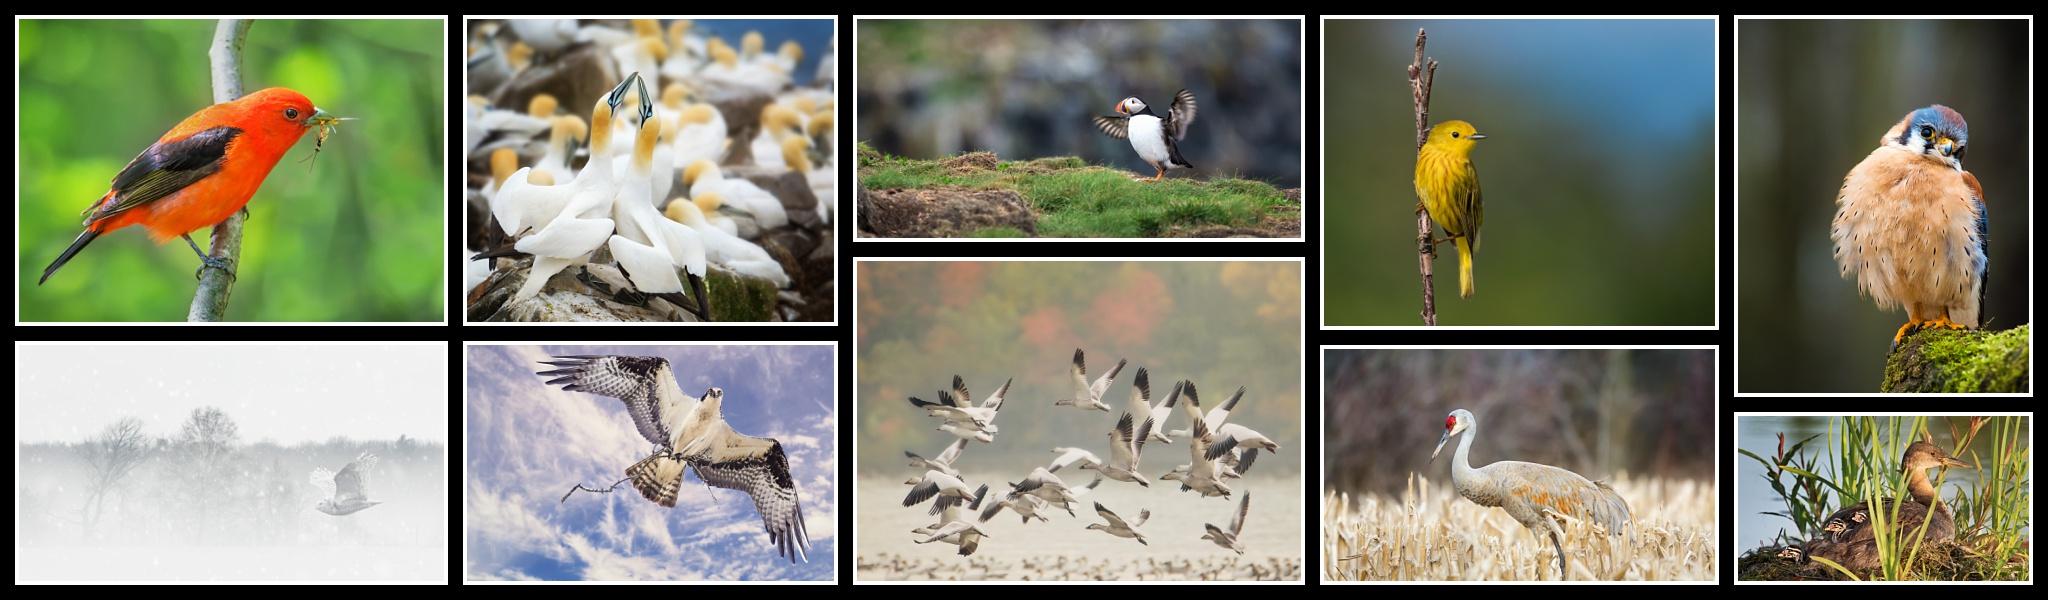 Ornithology/Bird Photography 2018 - The 10 Accepted images in my Ornithology/Bird Photography Accreditation.